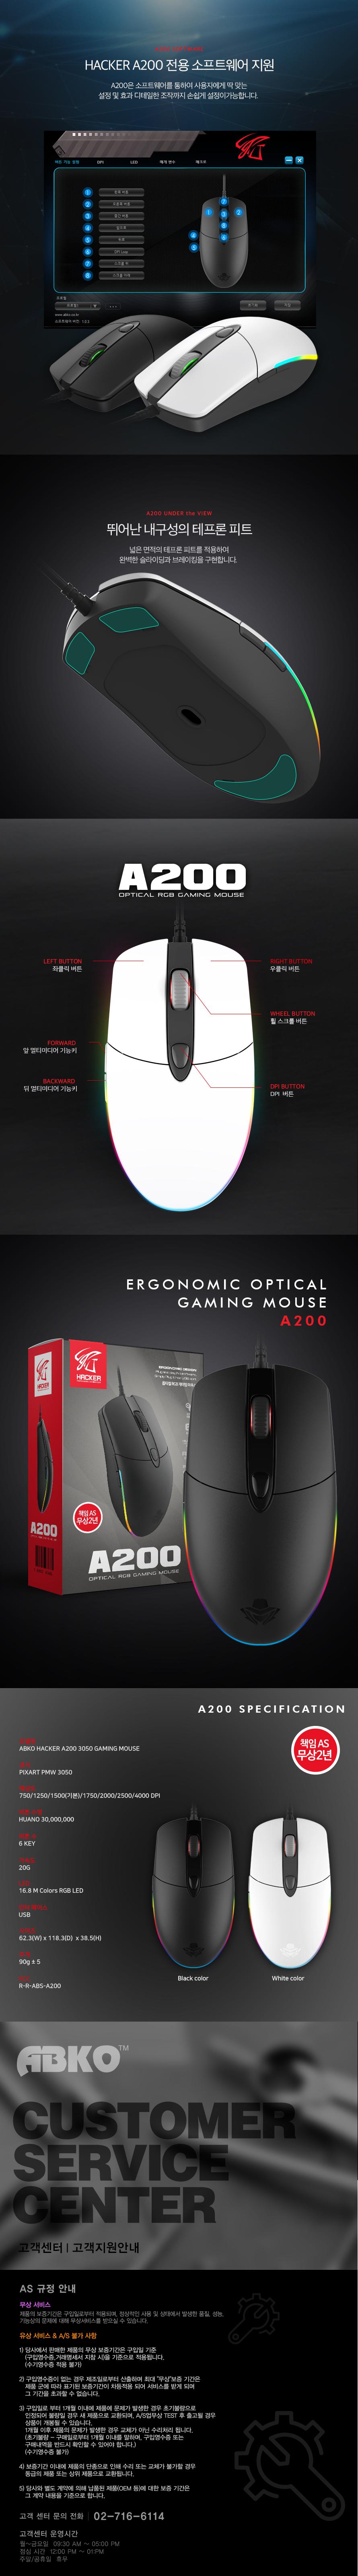 ABKO HACKER A200 3050 RGB 게이밍 마우스(블랙)